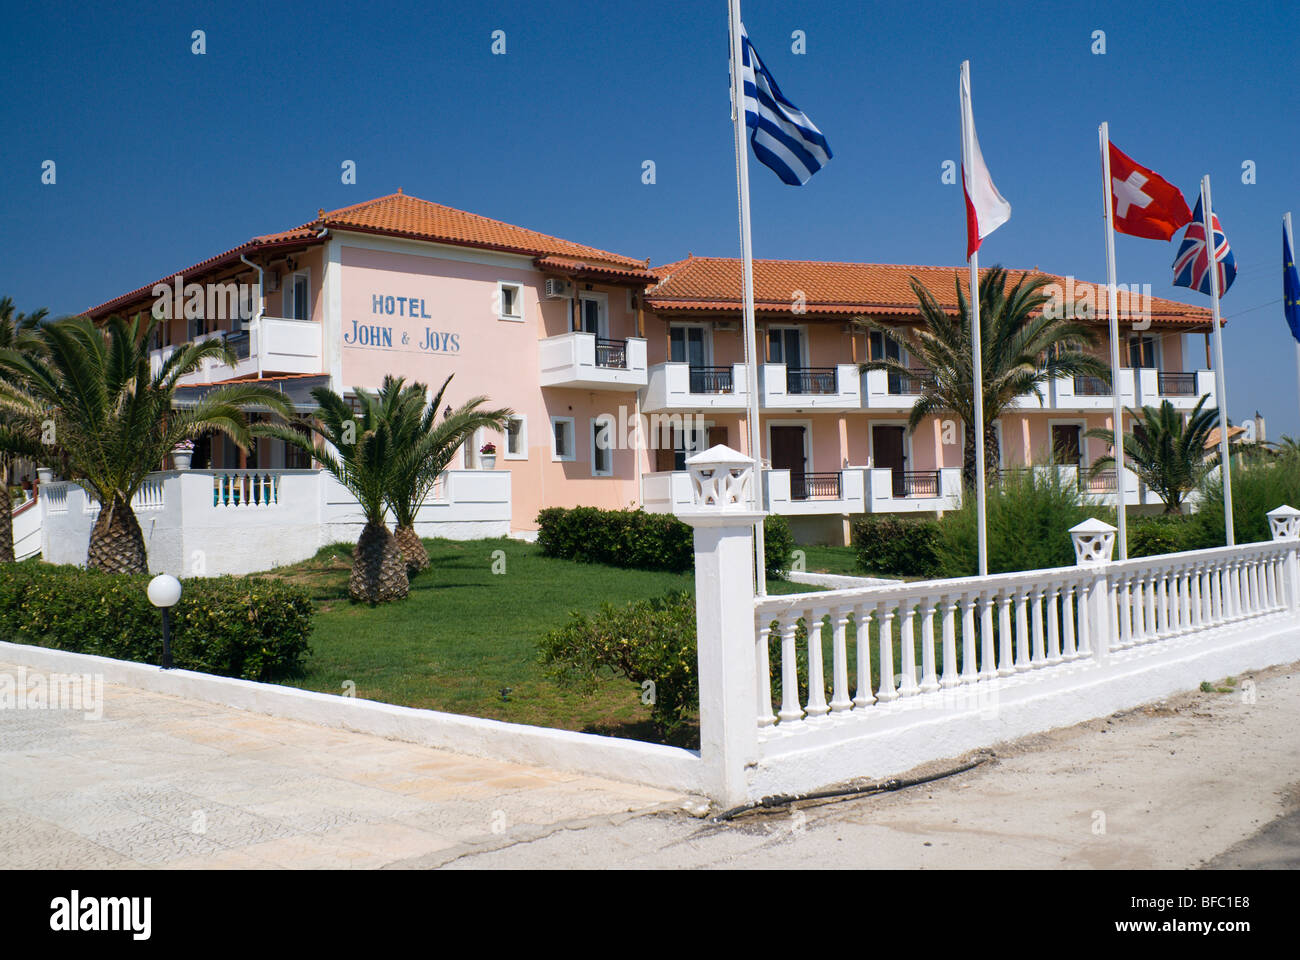 hotel john and joy kalmaki zakynthos / zante island part of the ionian islands greece - Stock Image